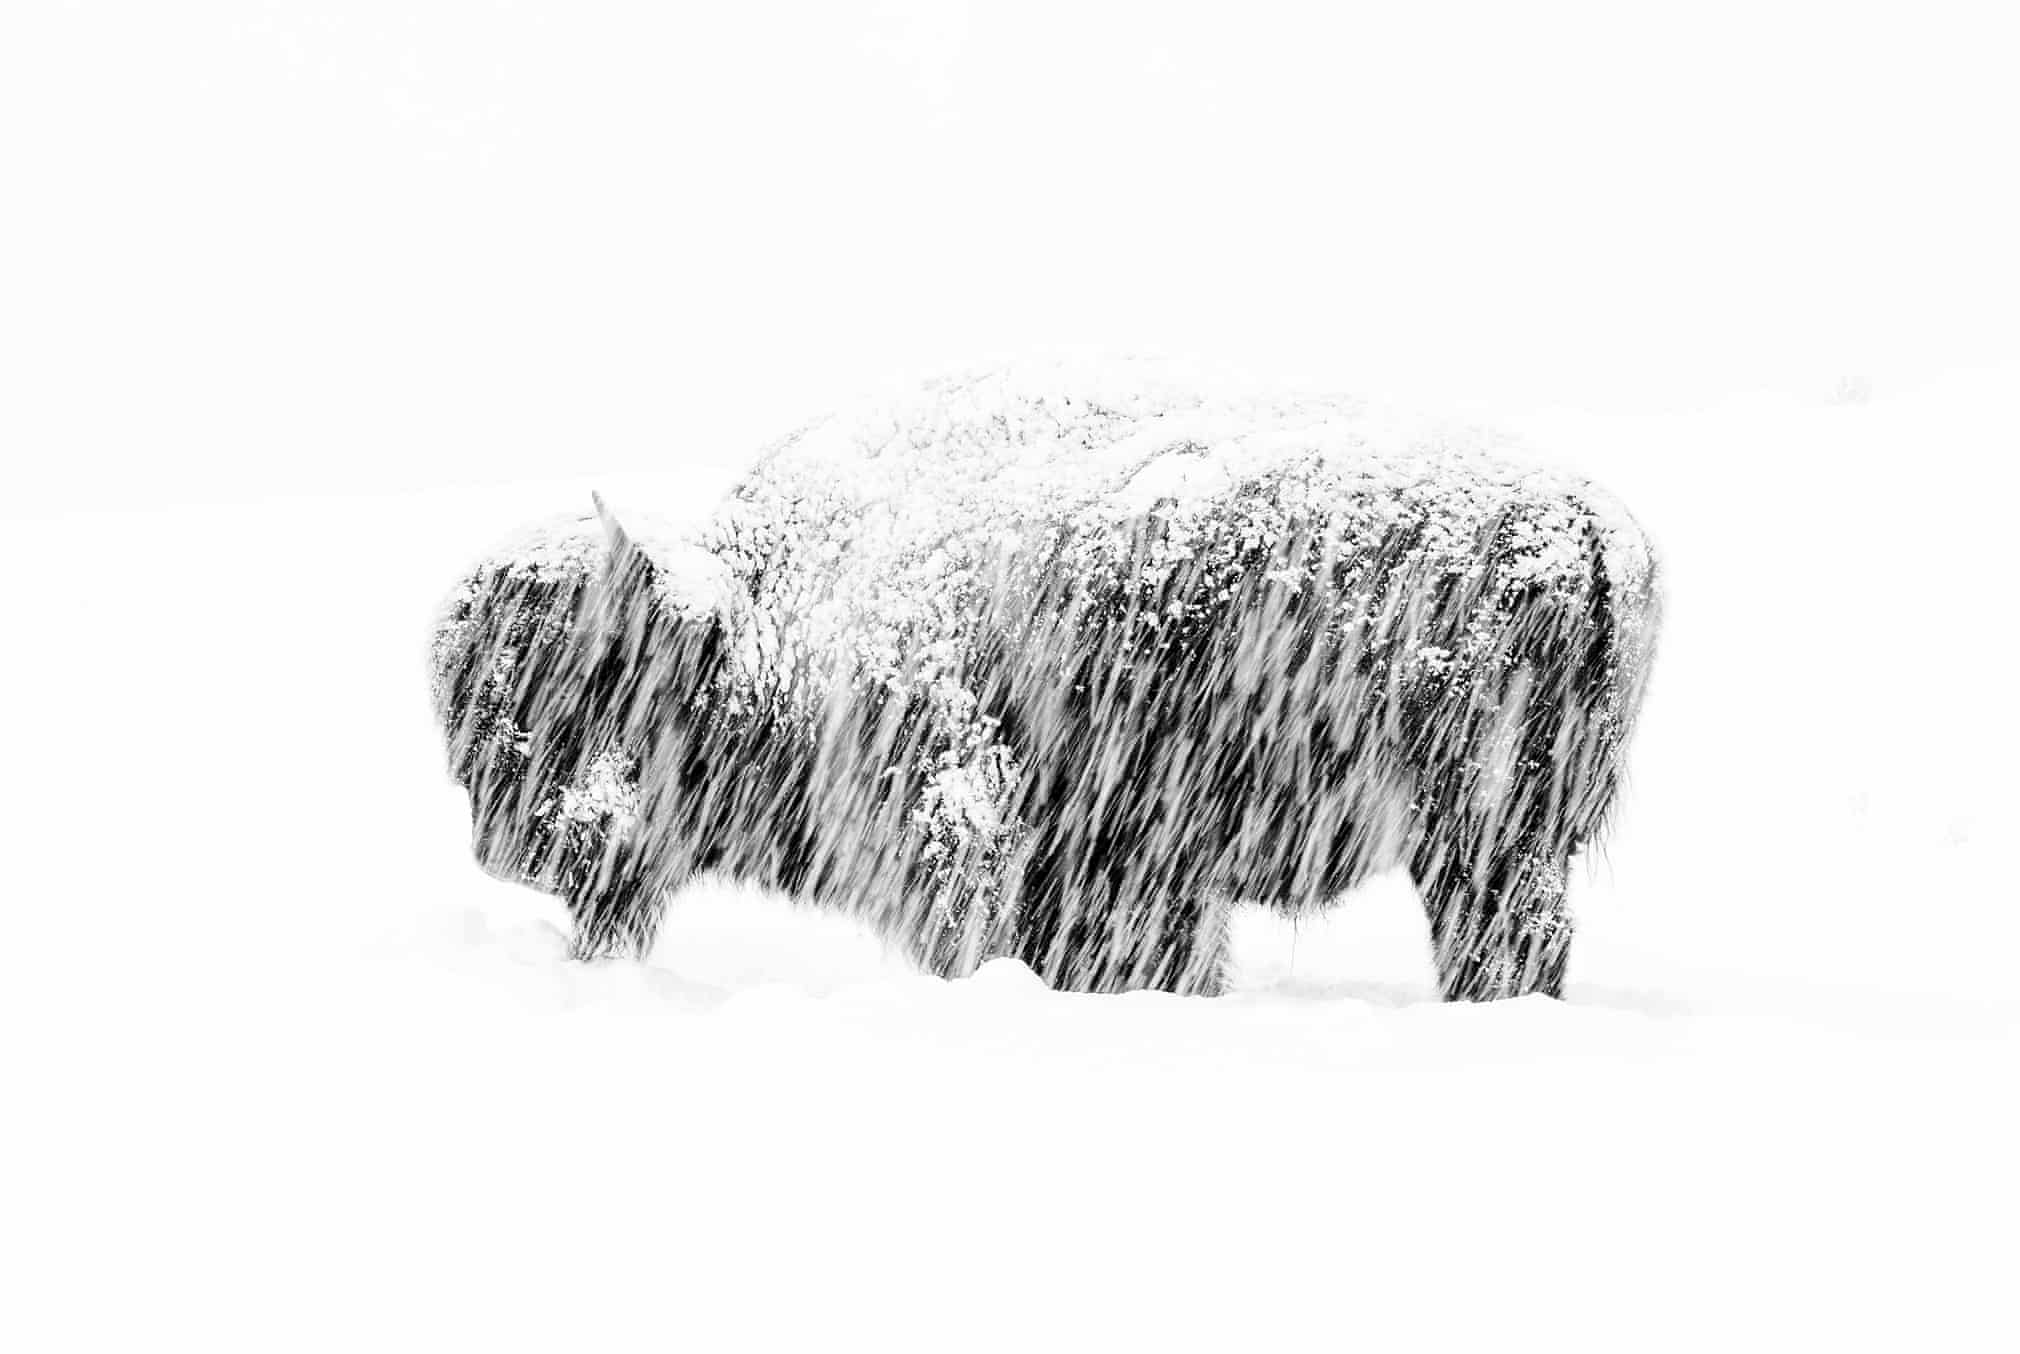 Wildlife photographer of the year 2019 winners